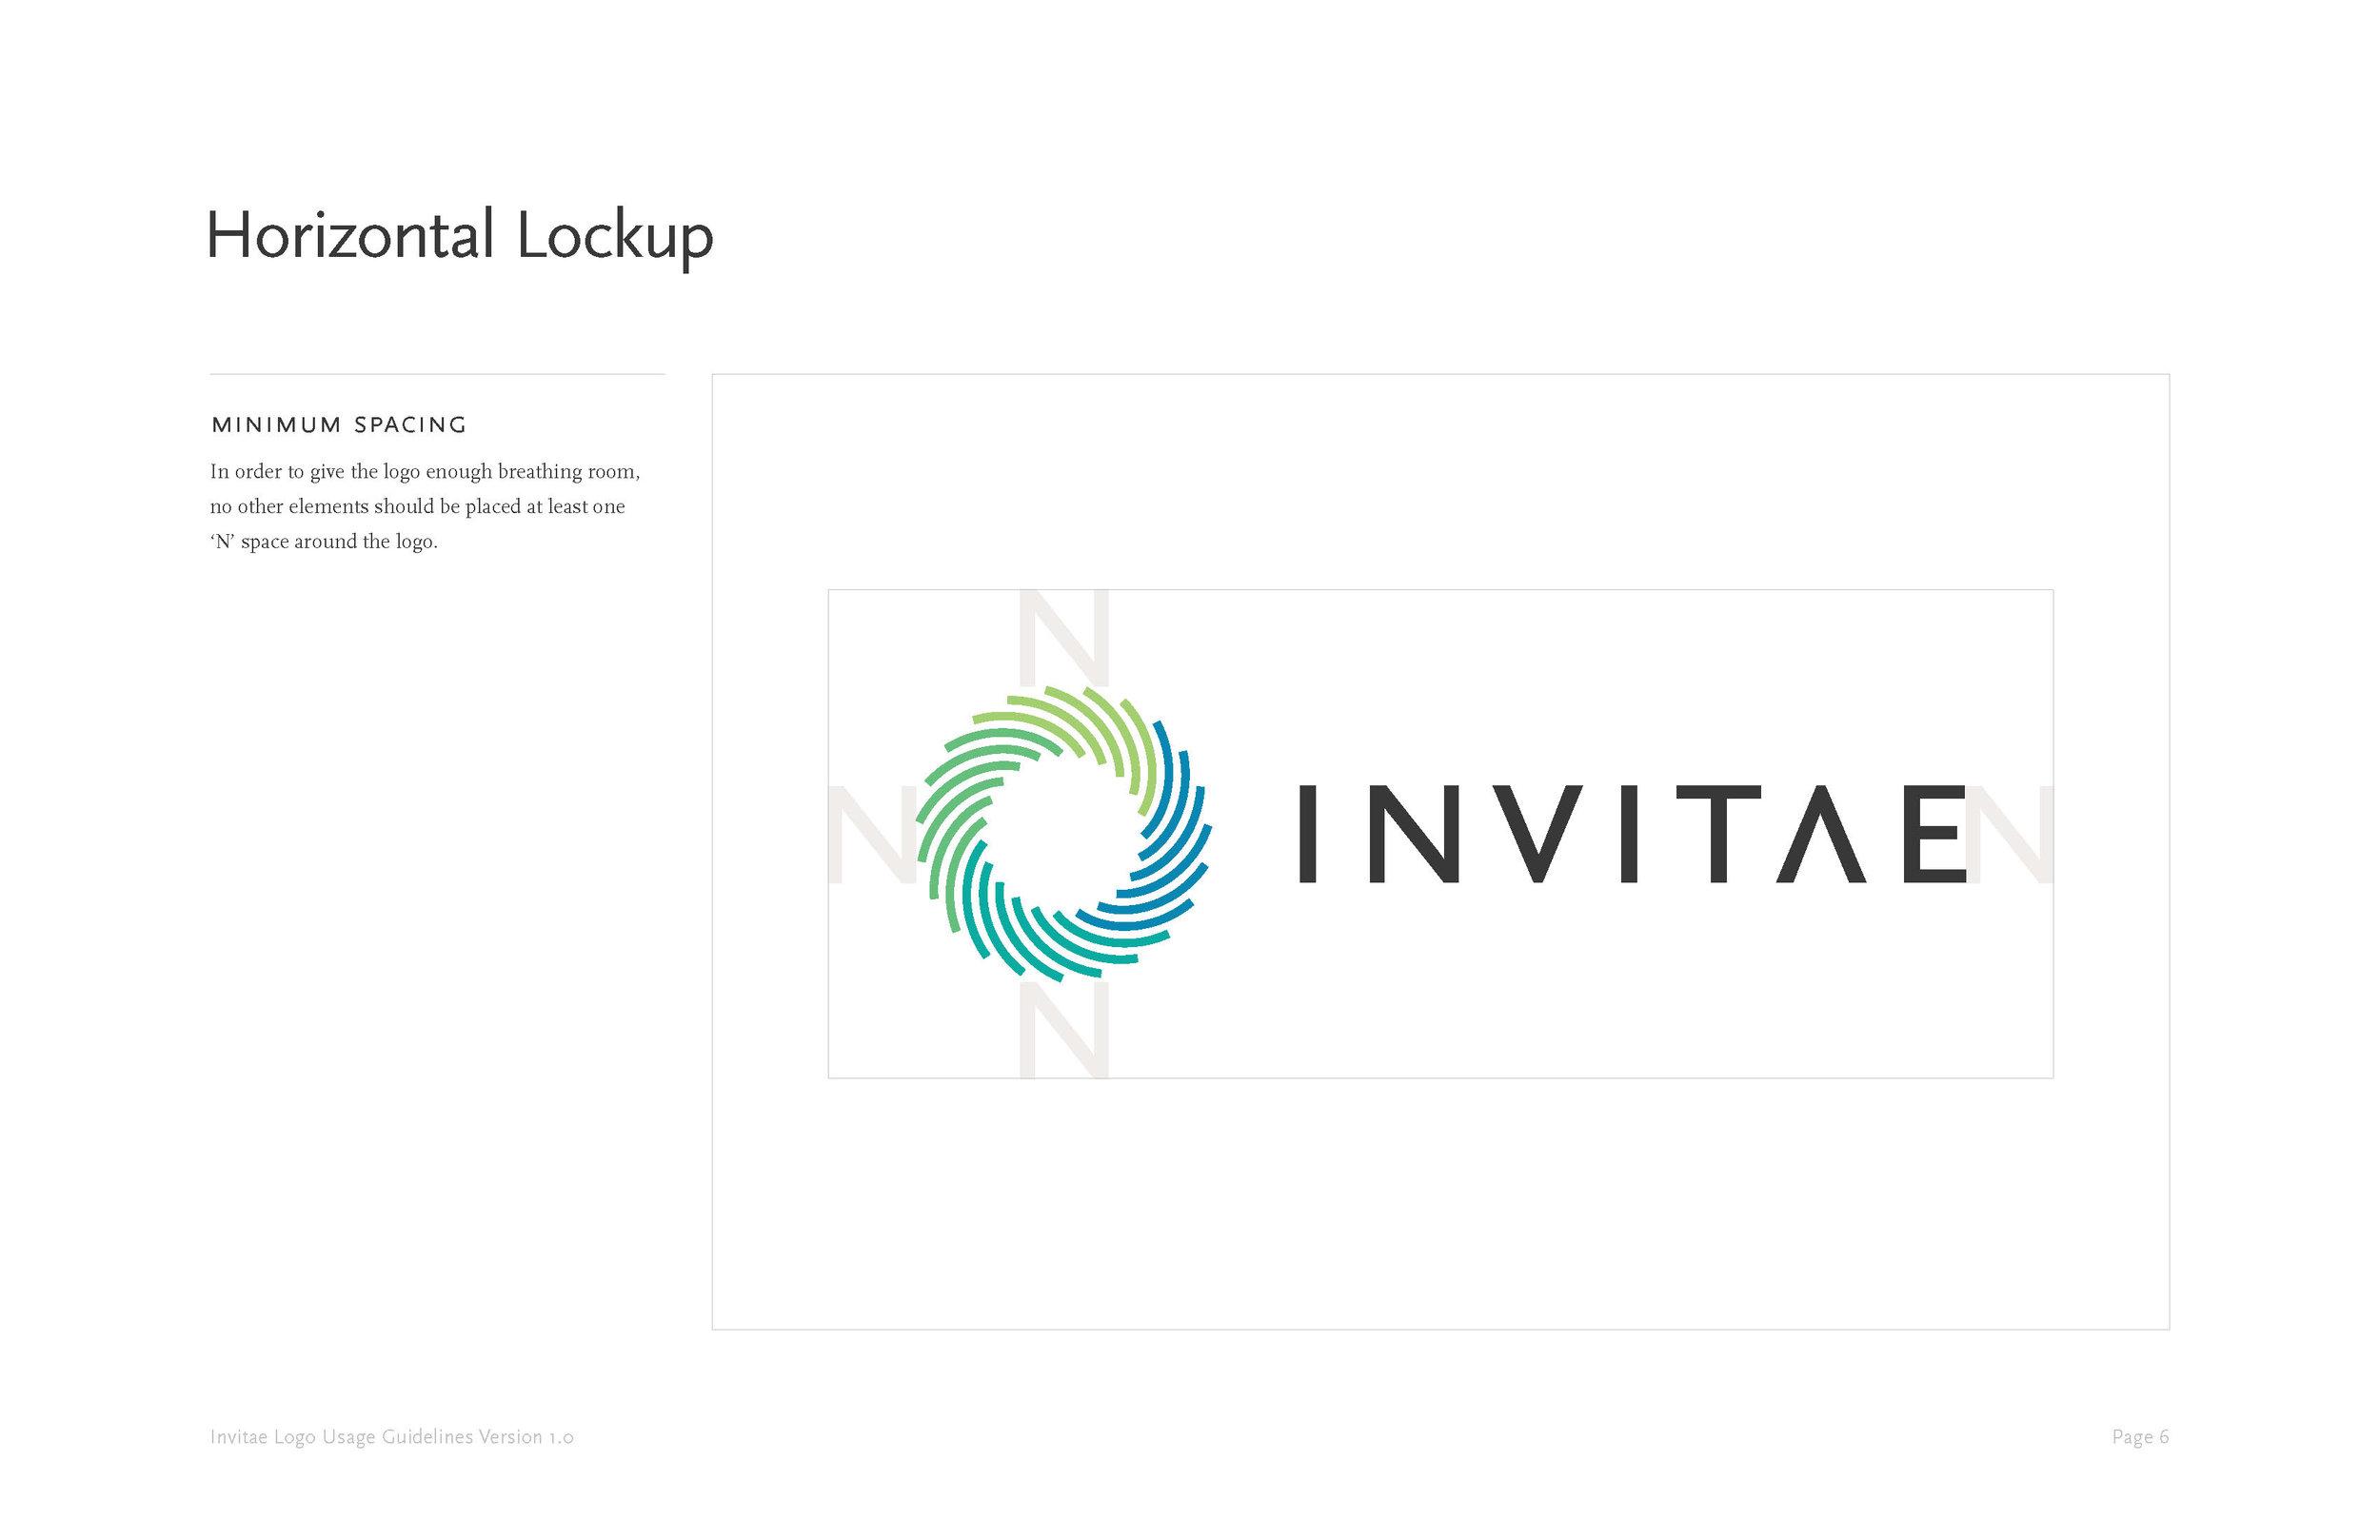 Invitae_logo_guidelines_Page_08.jpg